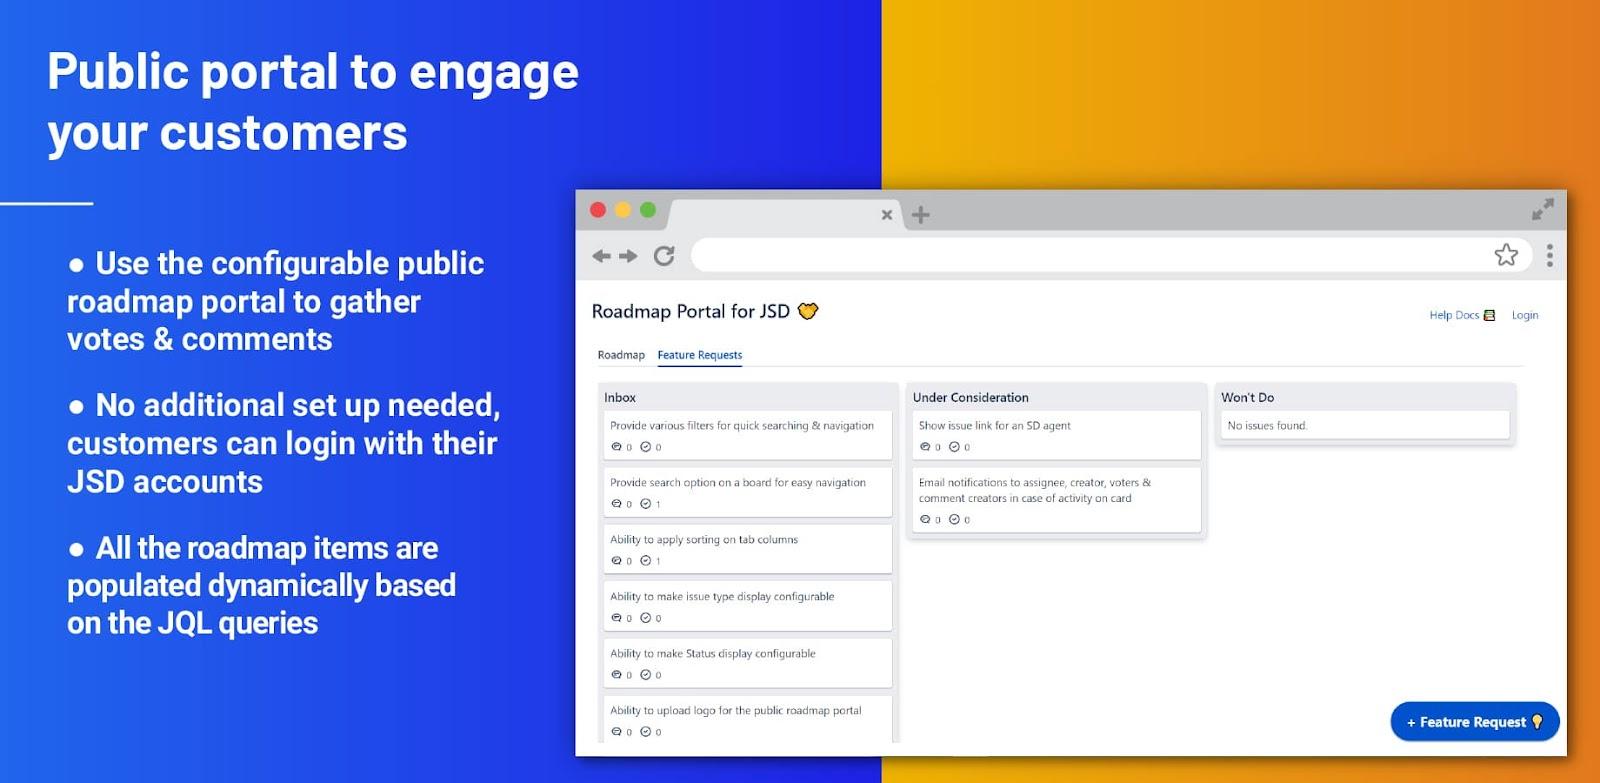 Public portal to engage customer